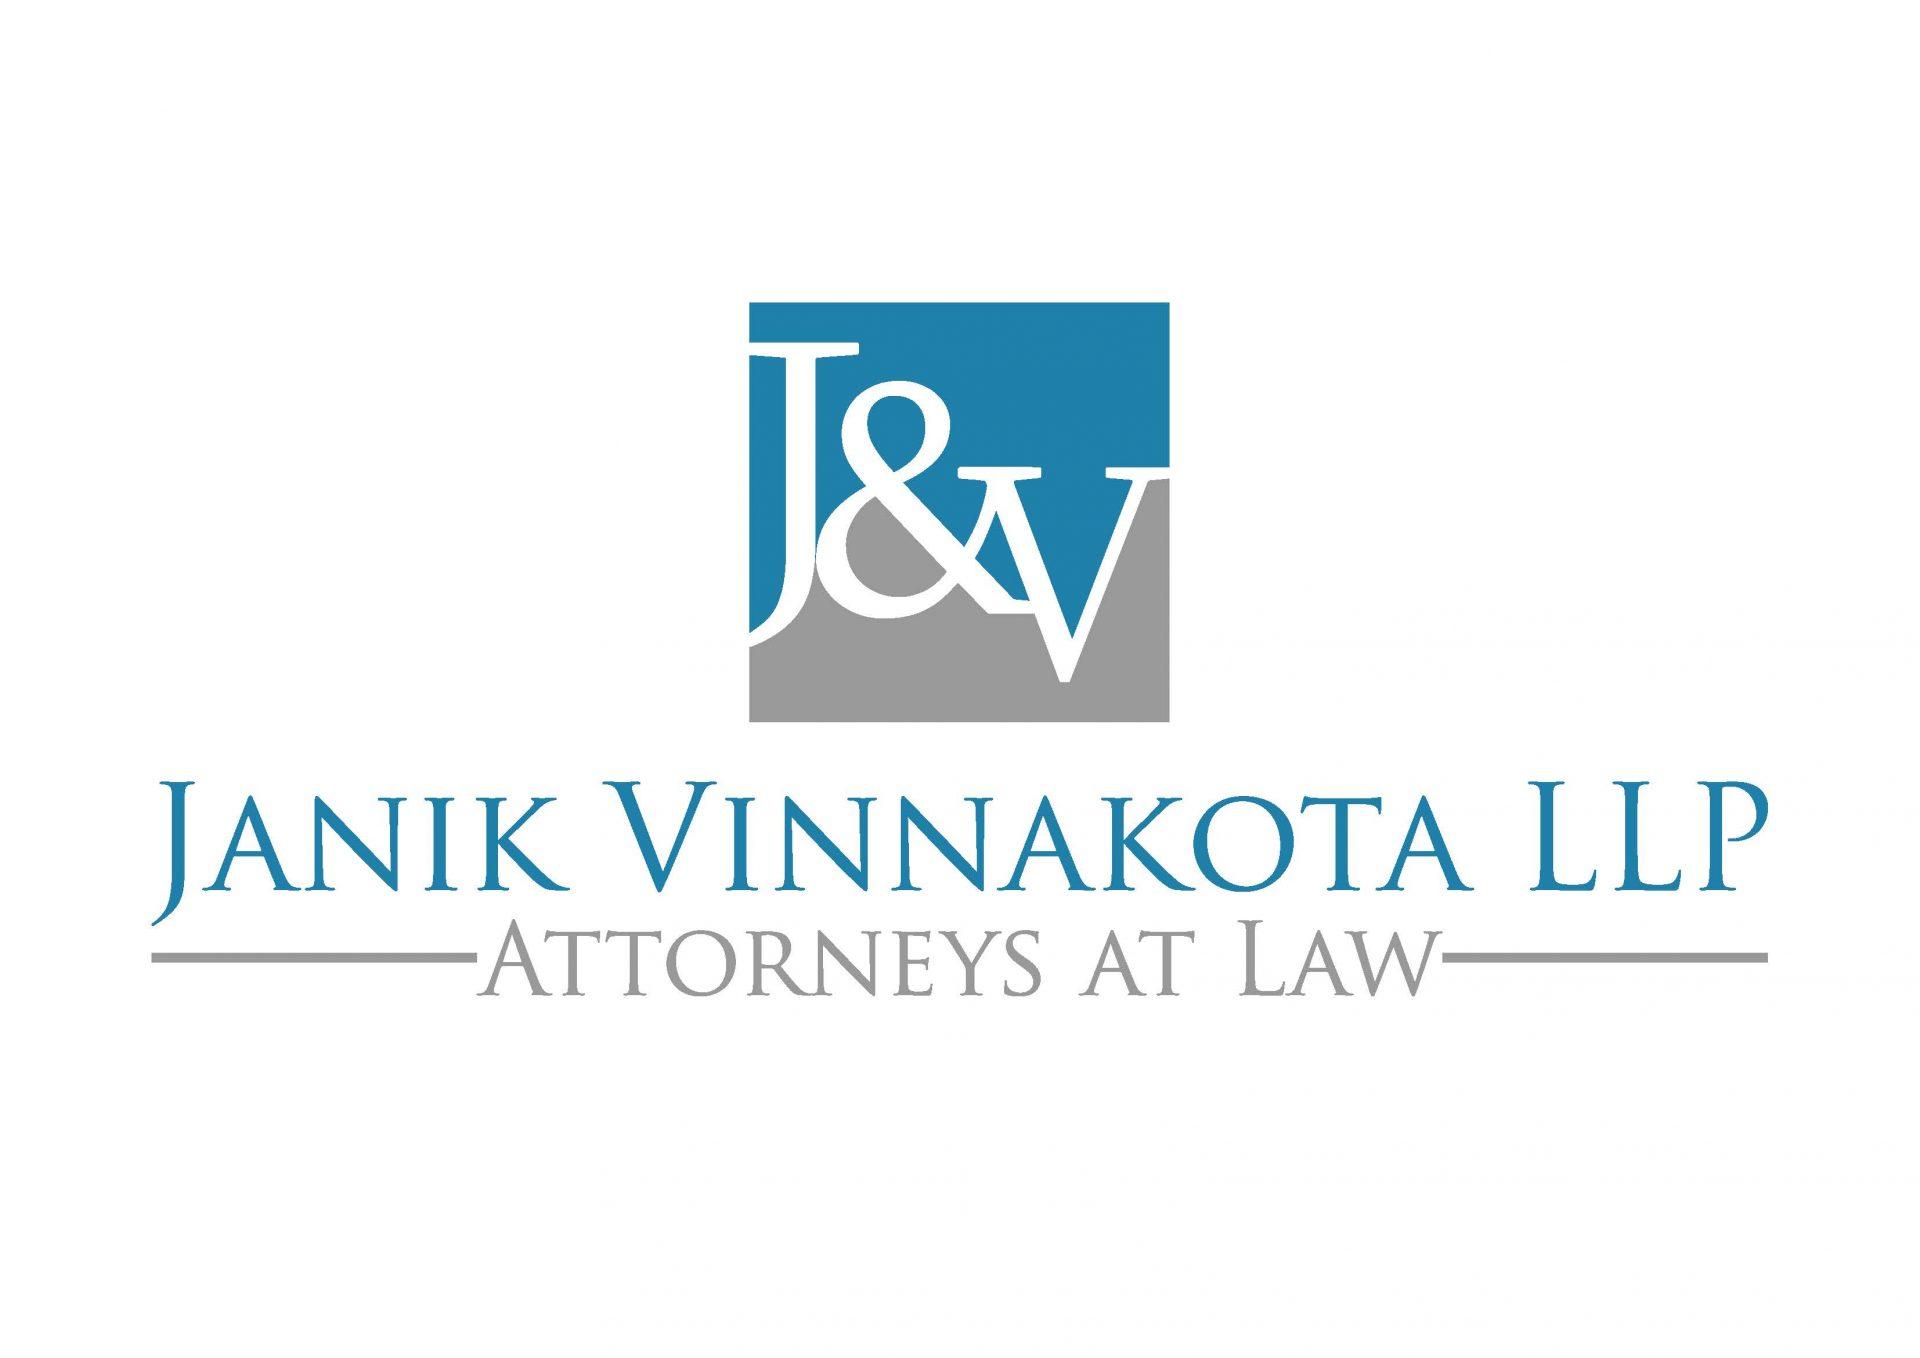 Janik Vinnakota LLP Logo